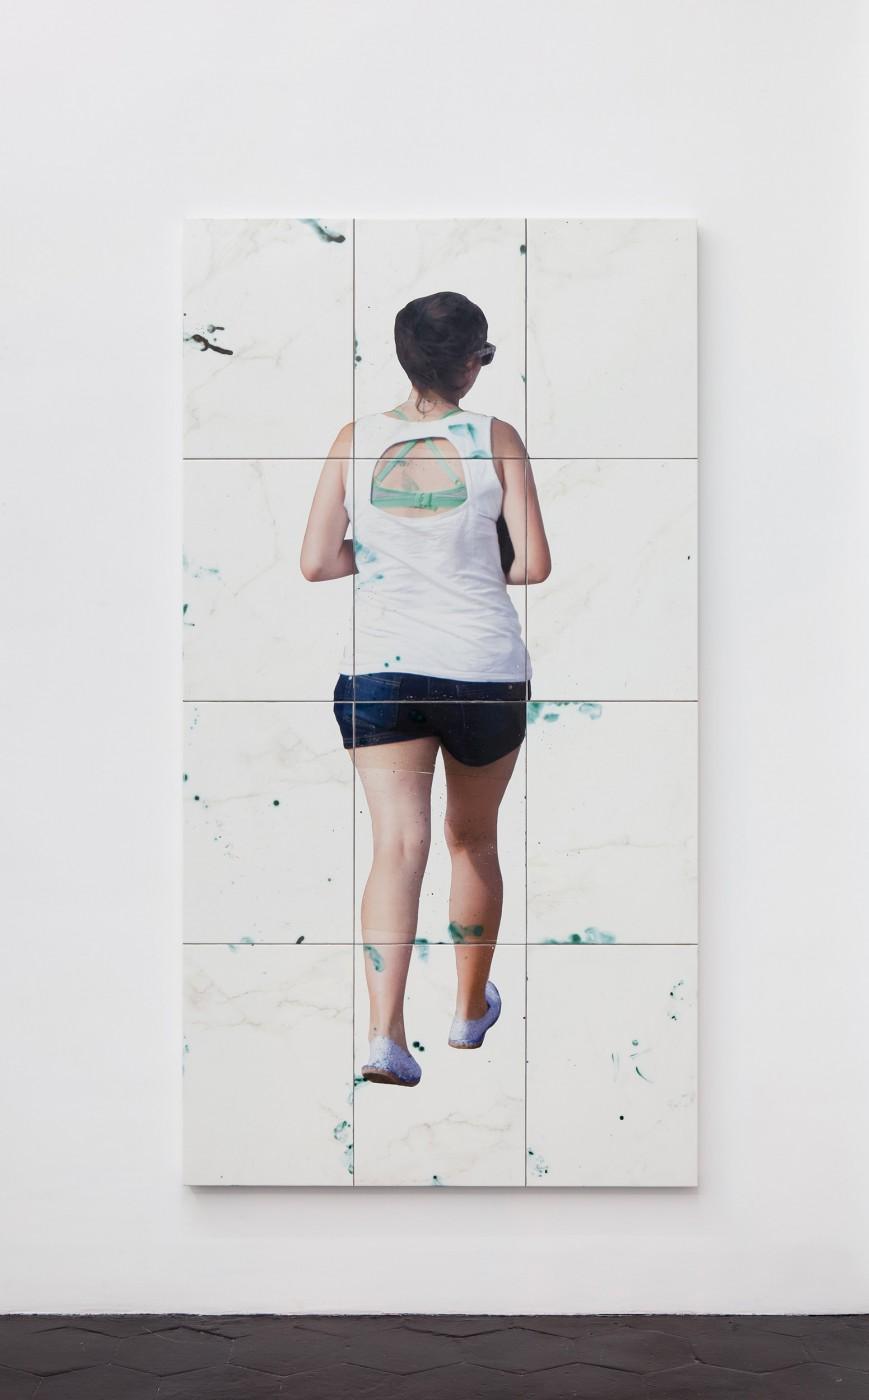 Tours  Untitled , 2014   Glazed ceramics, ceramic transfer, aluminium, wood   181 x 91 x 3,5 cm / 71.2 x 35.8 x 1.3 in  Tom Humphreys